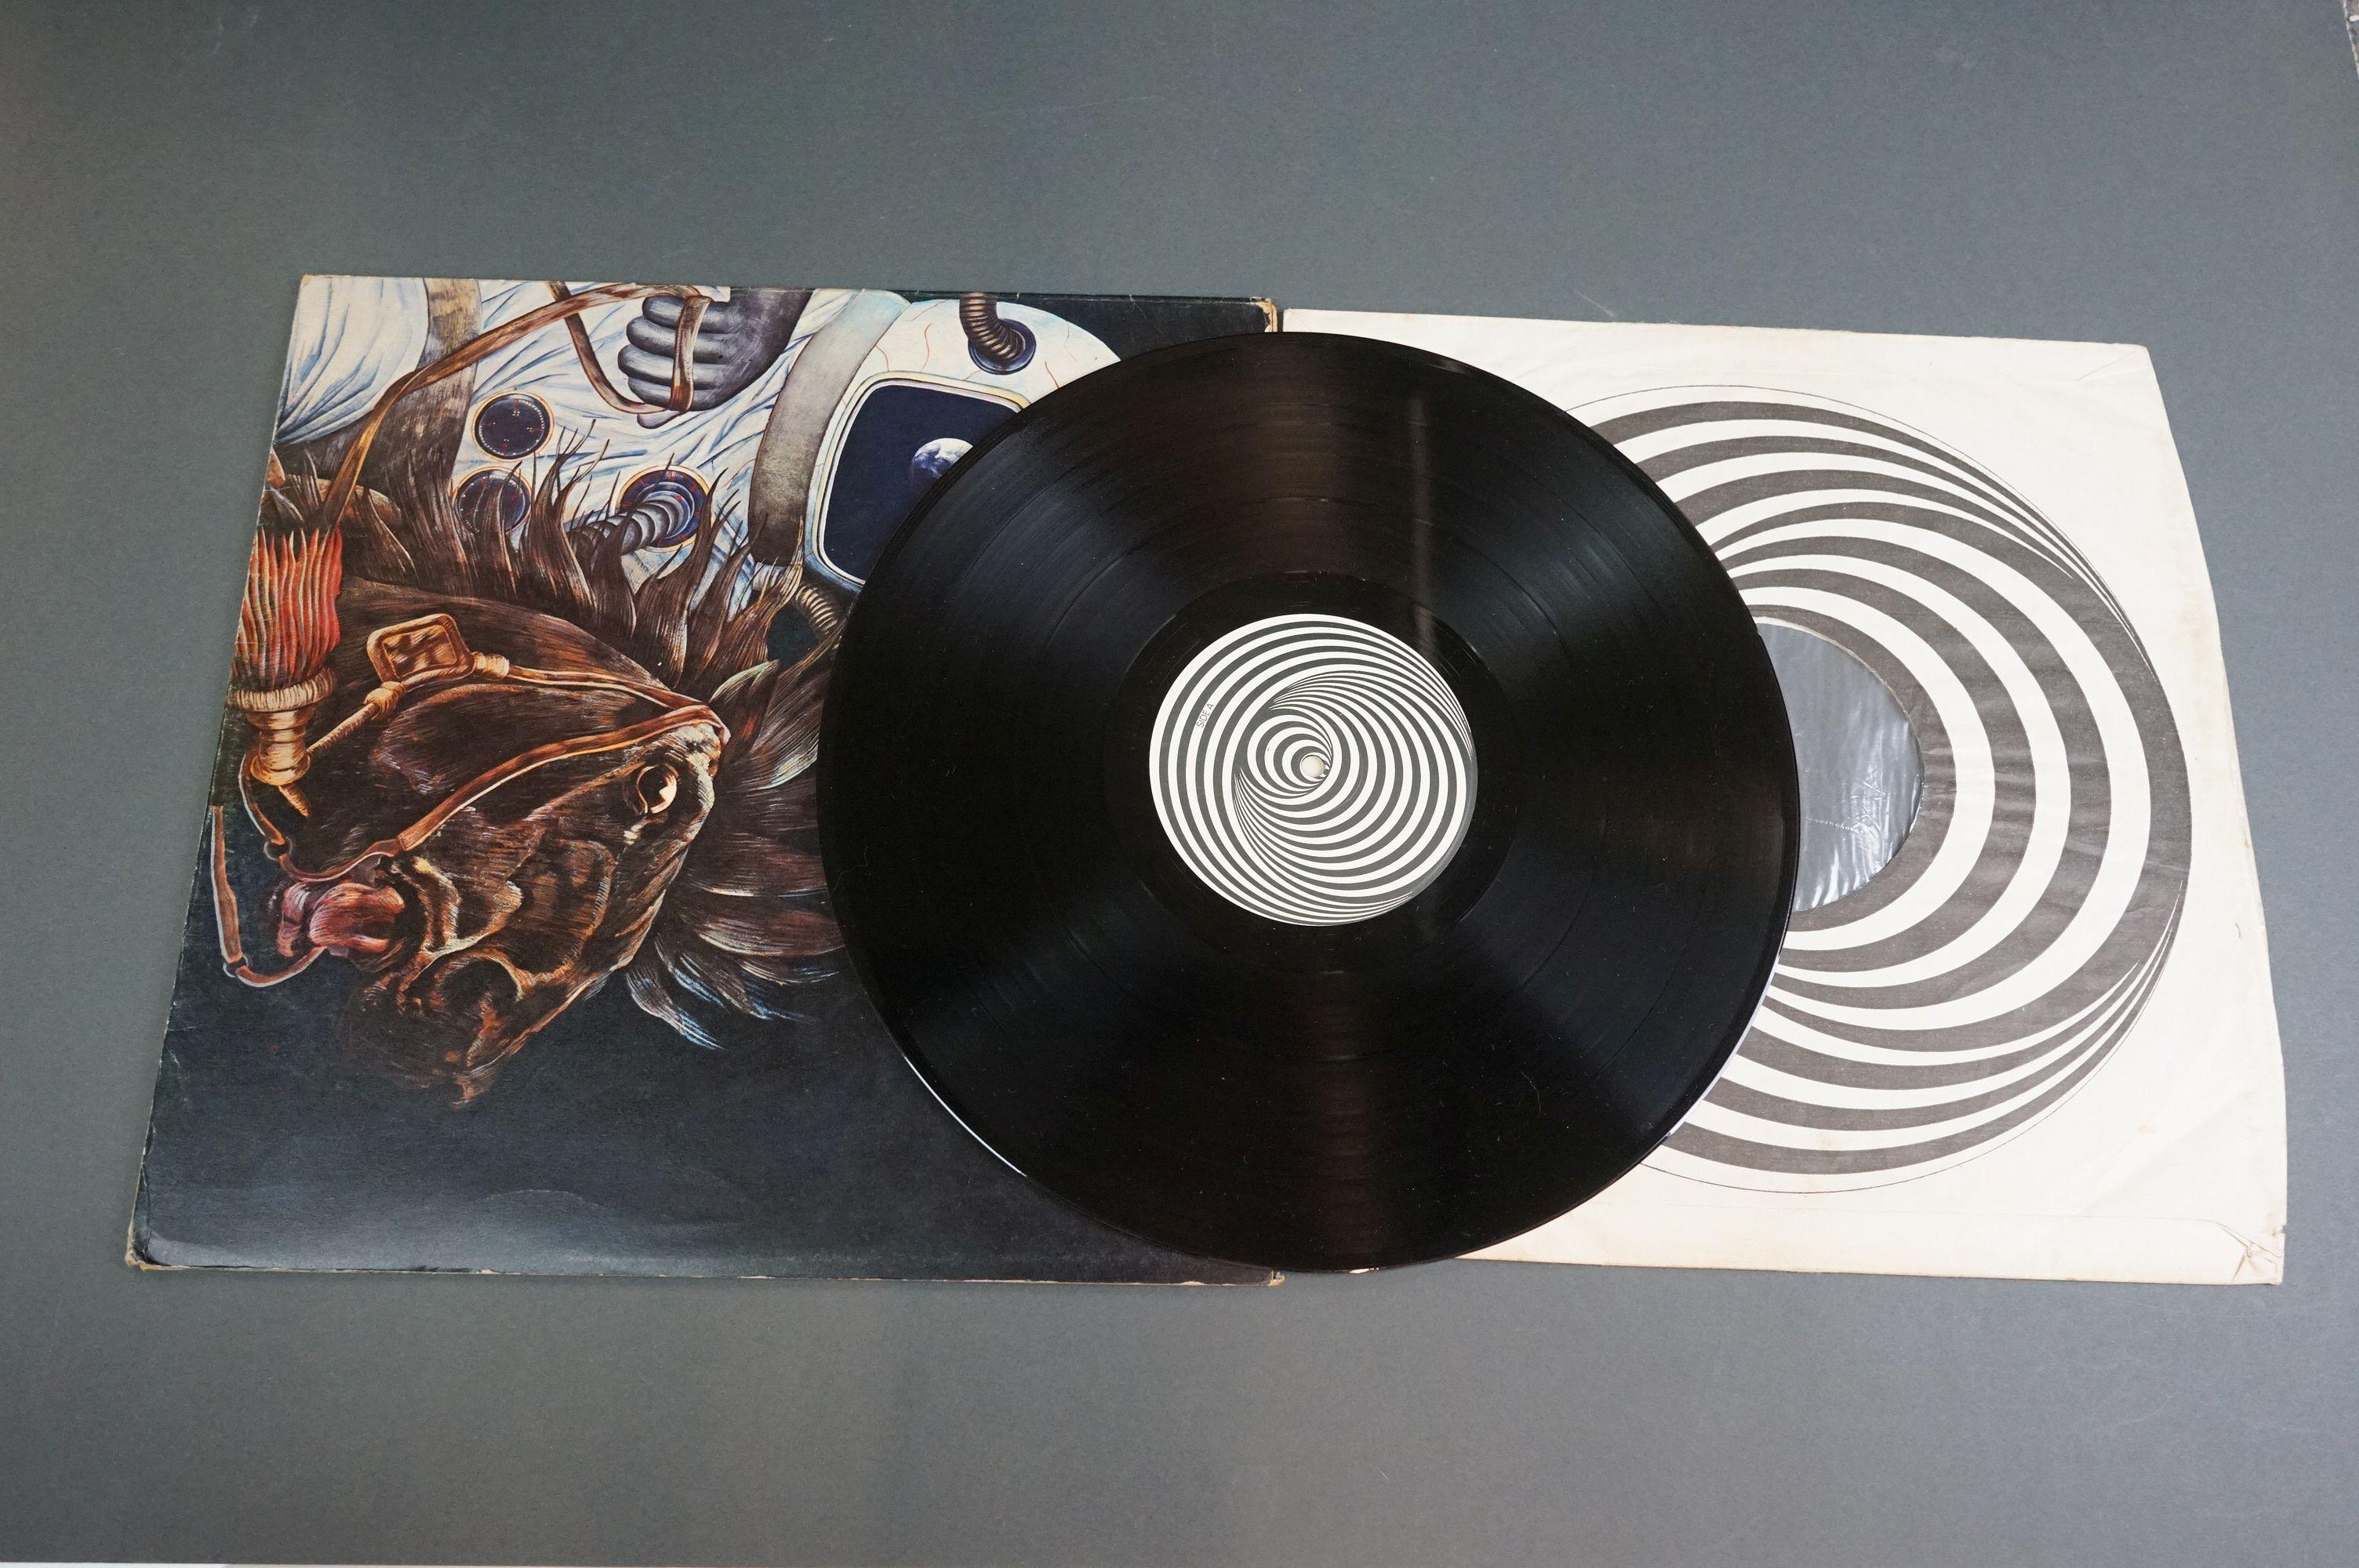 Vinyl - Two Beggars Opera LPs to include Pathfinder on Vertigo 6360073 small swirl label, foldout - Image 4 of 5